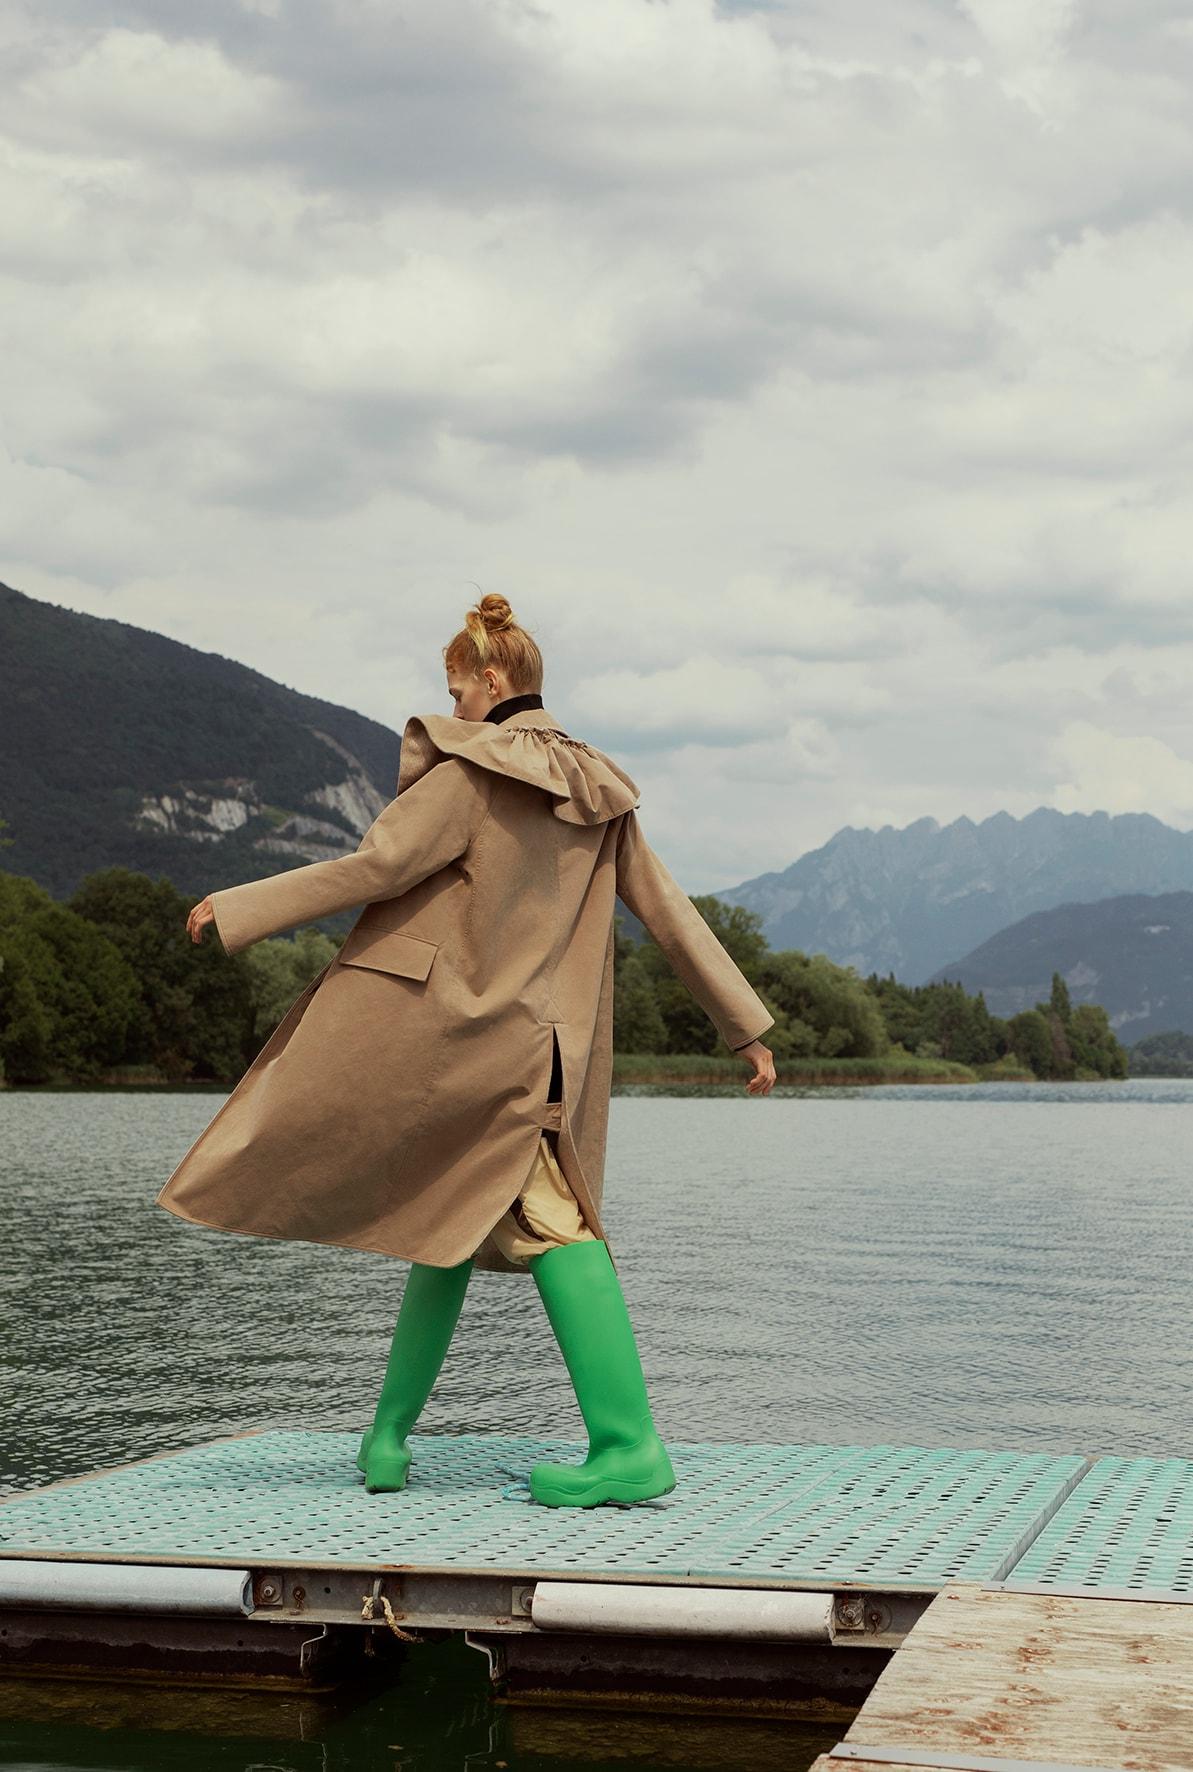 Trench in cotone doppiato in lana con maxi collo, TOD'S. Pantaloni in nylon stampato, VERSACE (1.200 €). Stivali in gomma, BOTTEGA VENETA (590 €).